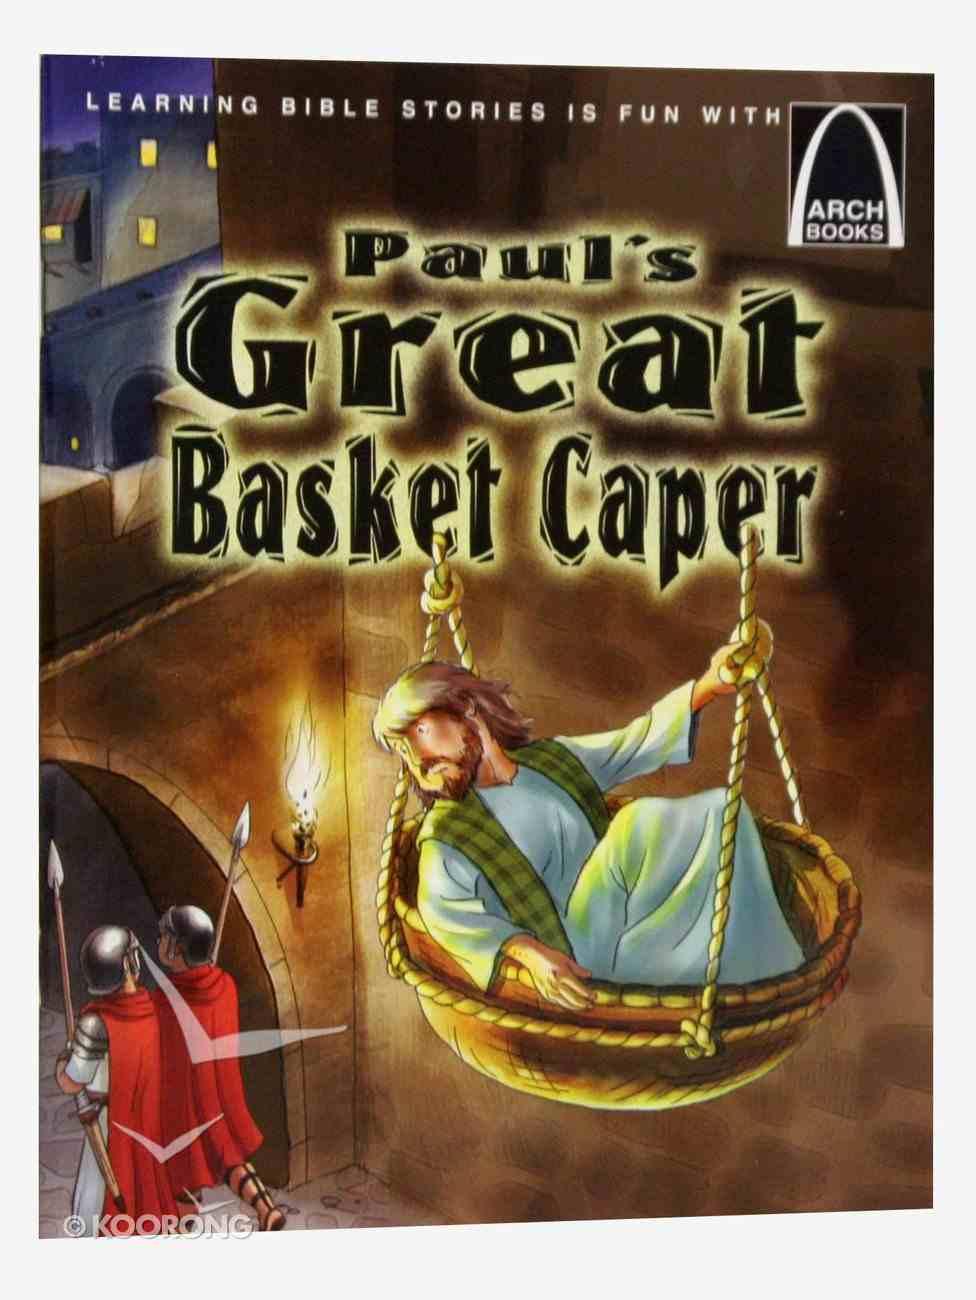 Paul's Great Basket Caper (Arch Books Series) Paperback